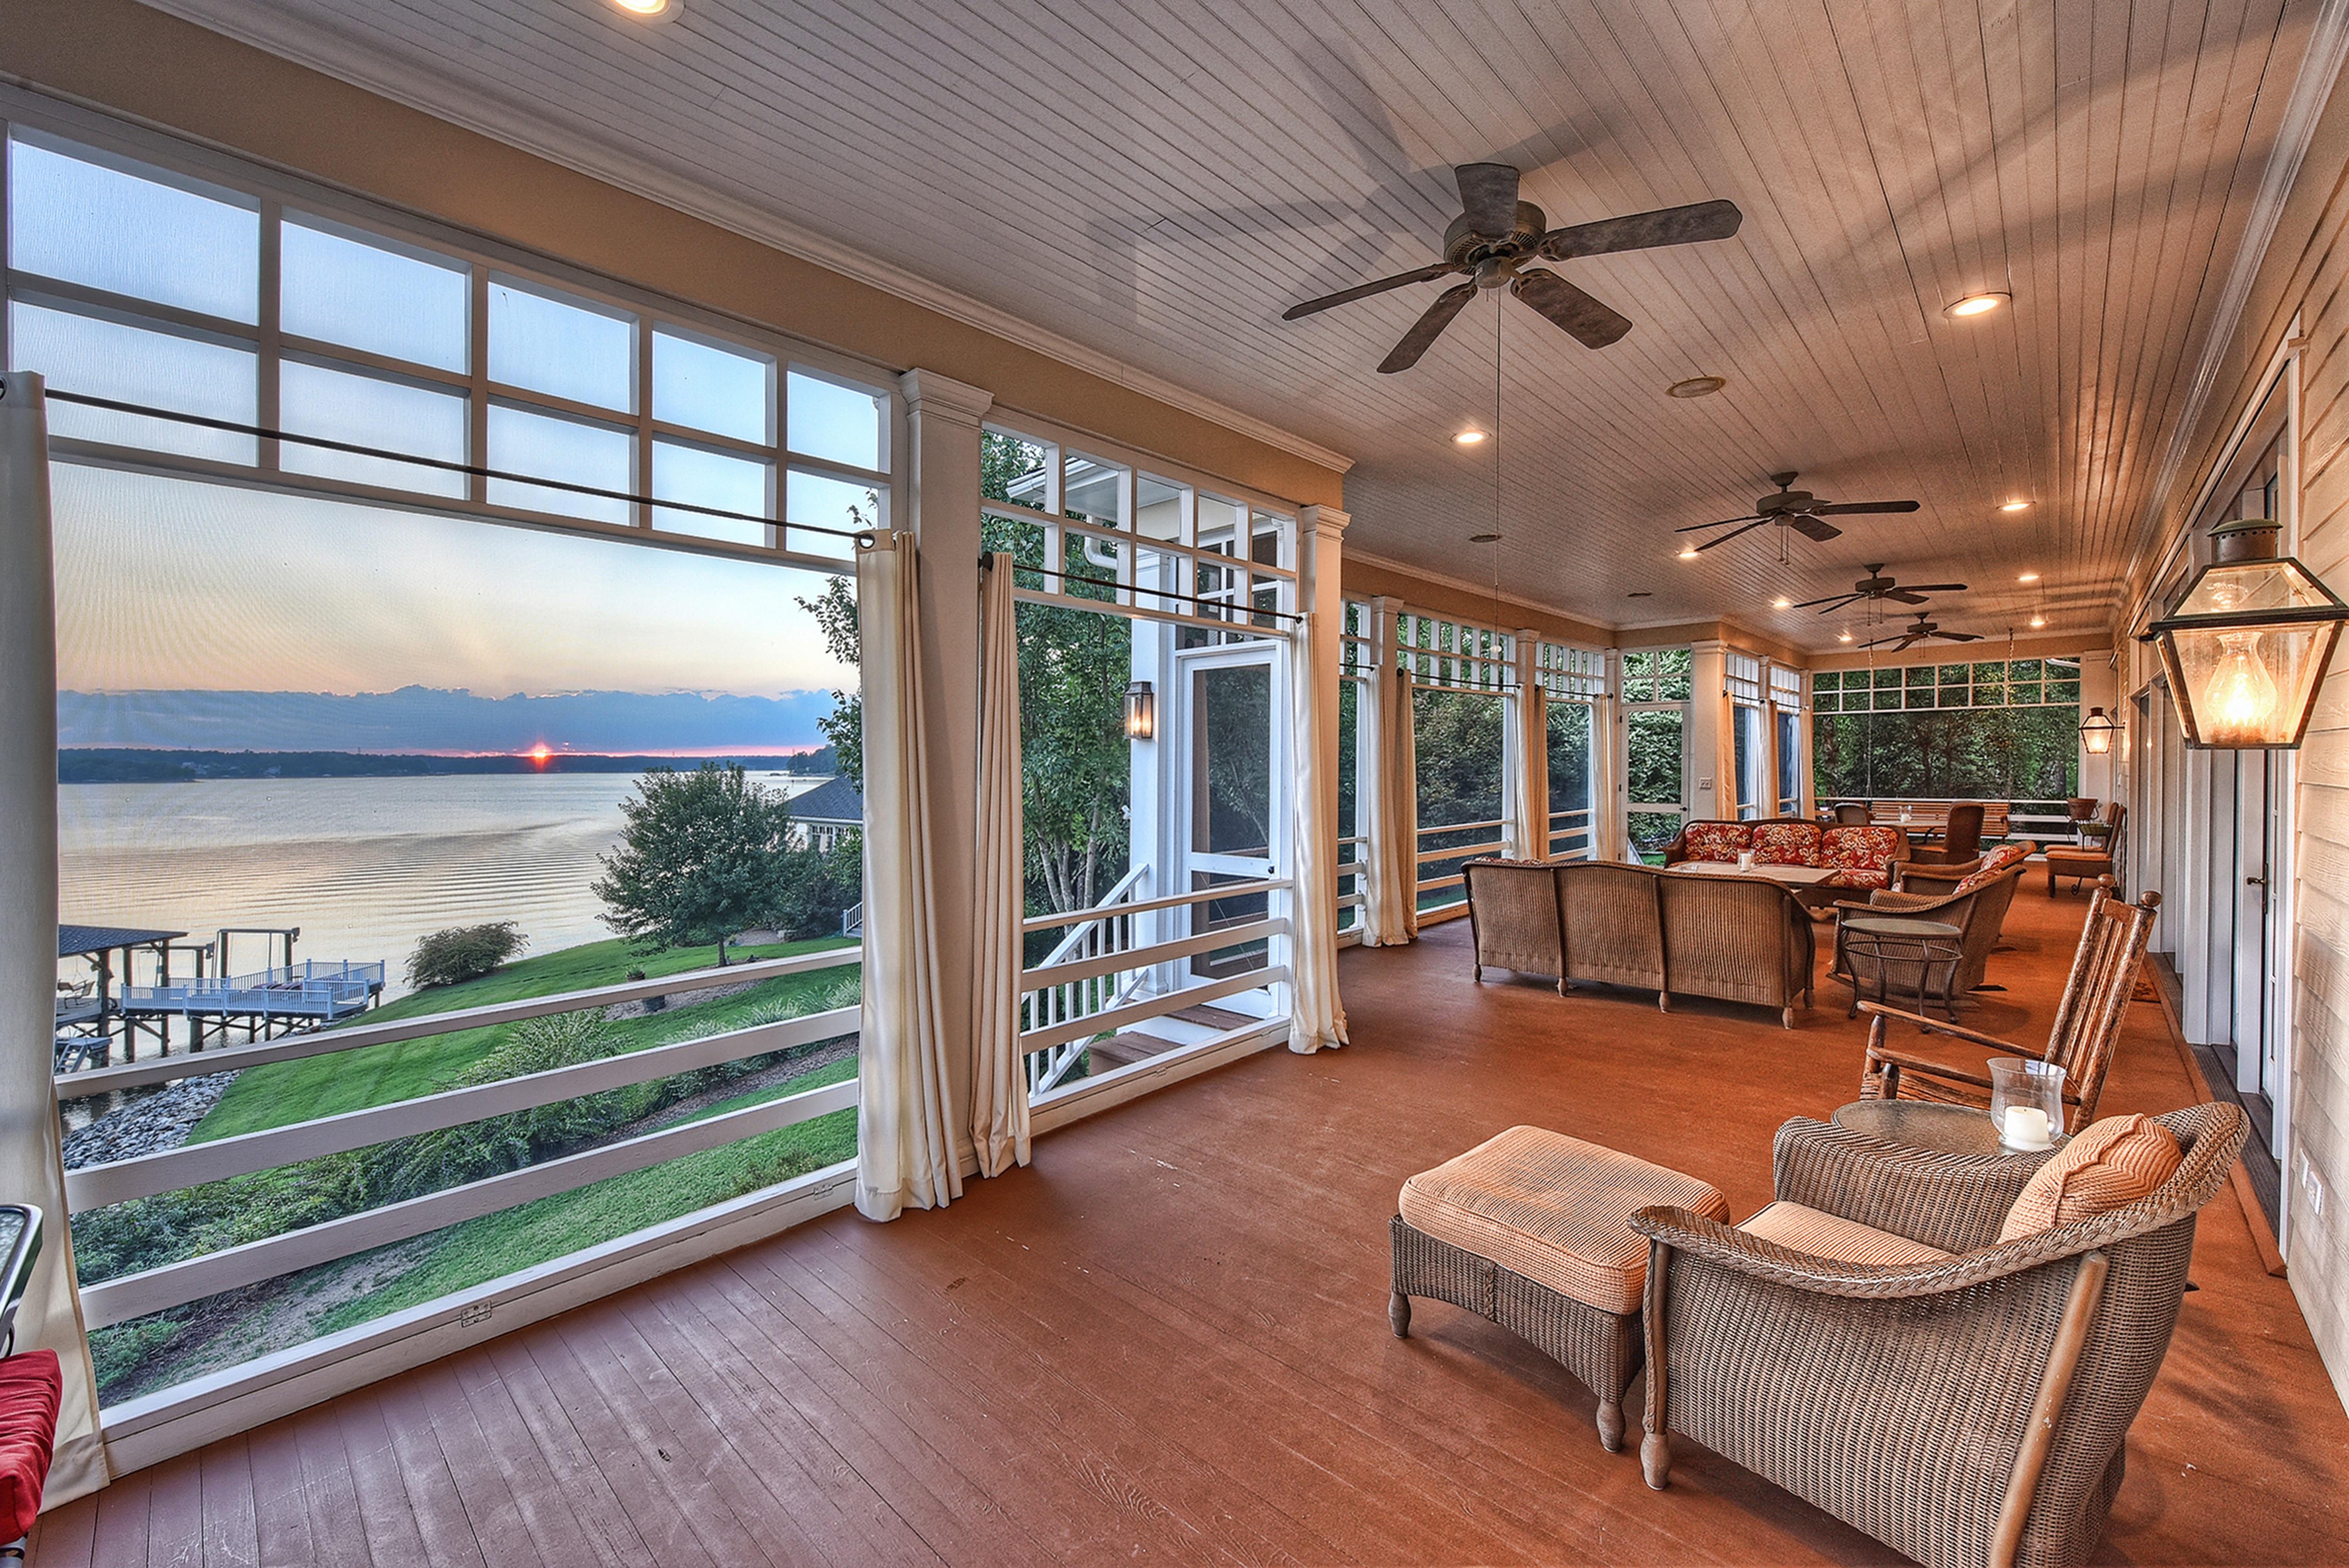 Portfolio of Fine Homes – Charlotte, Lake Norman and Beyond